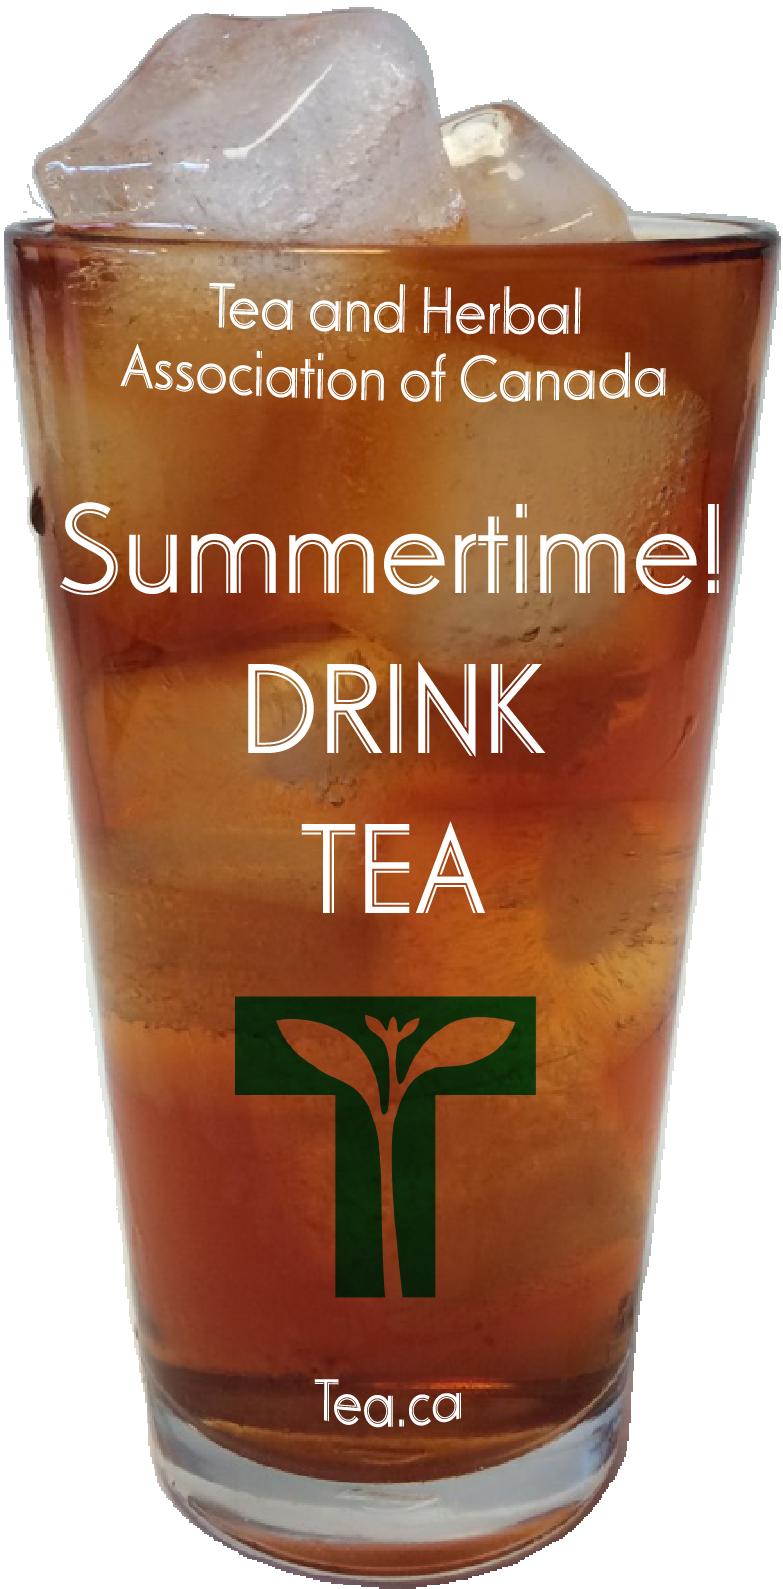 Summertime! Drink Tea!